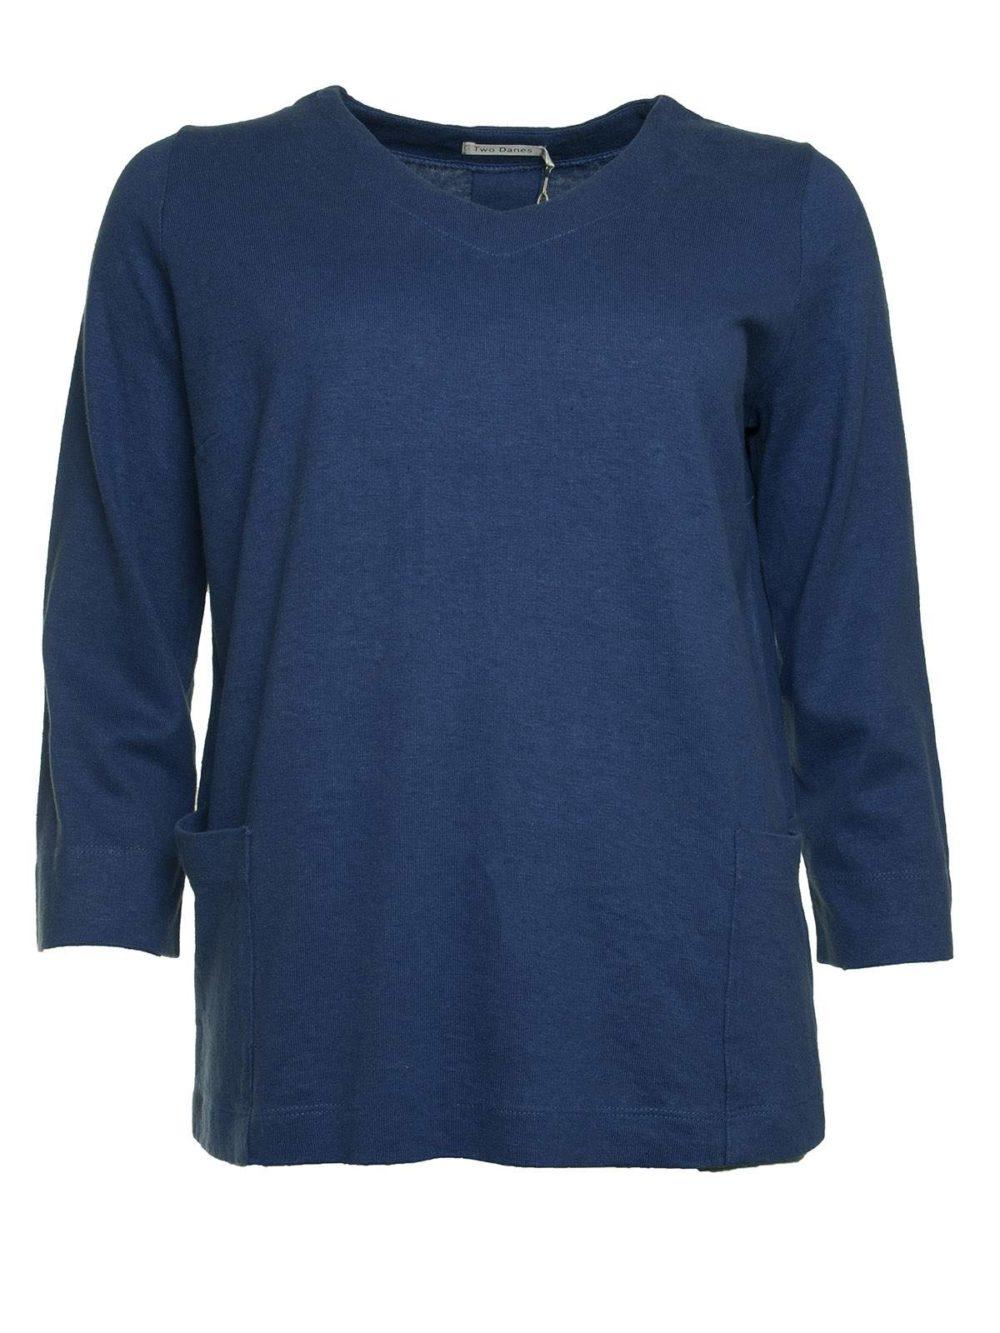 Haiam T-Shirt Two Danes Katie Kerr Women's Clothing